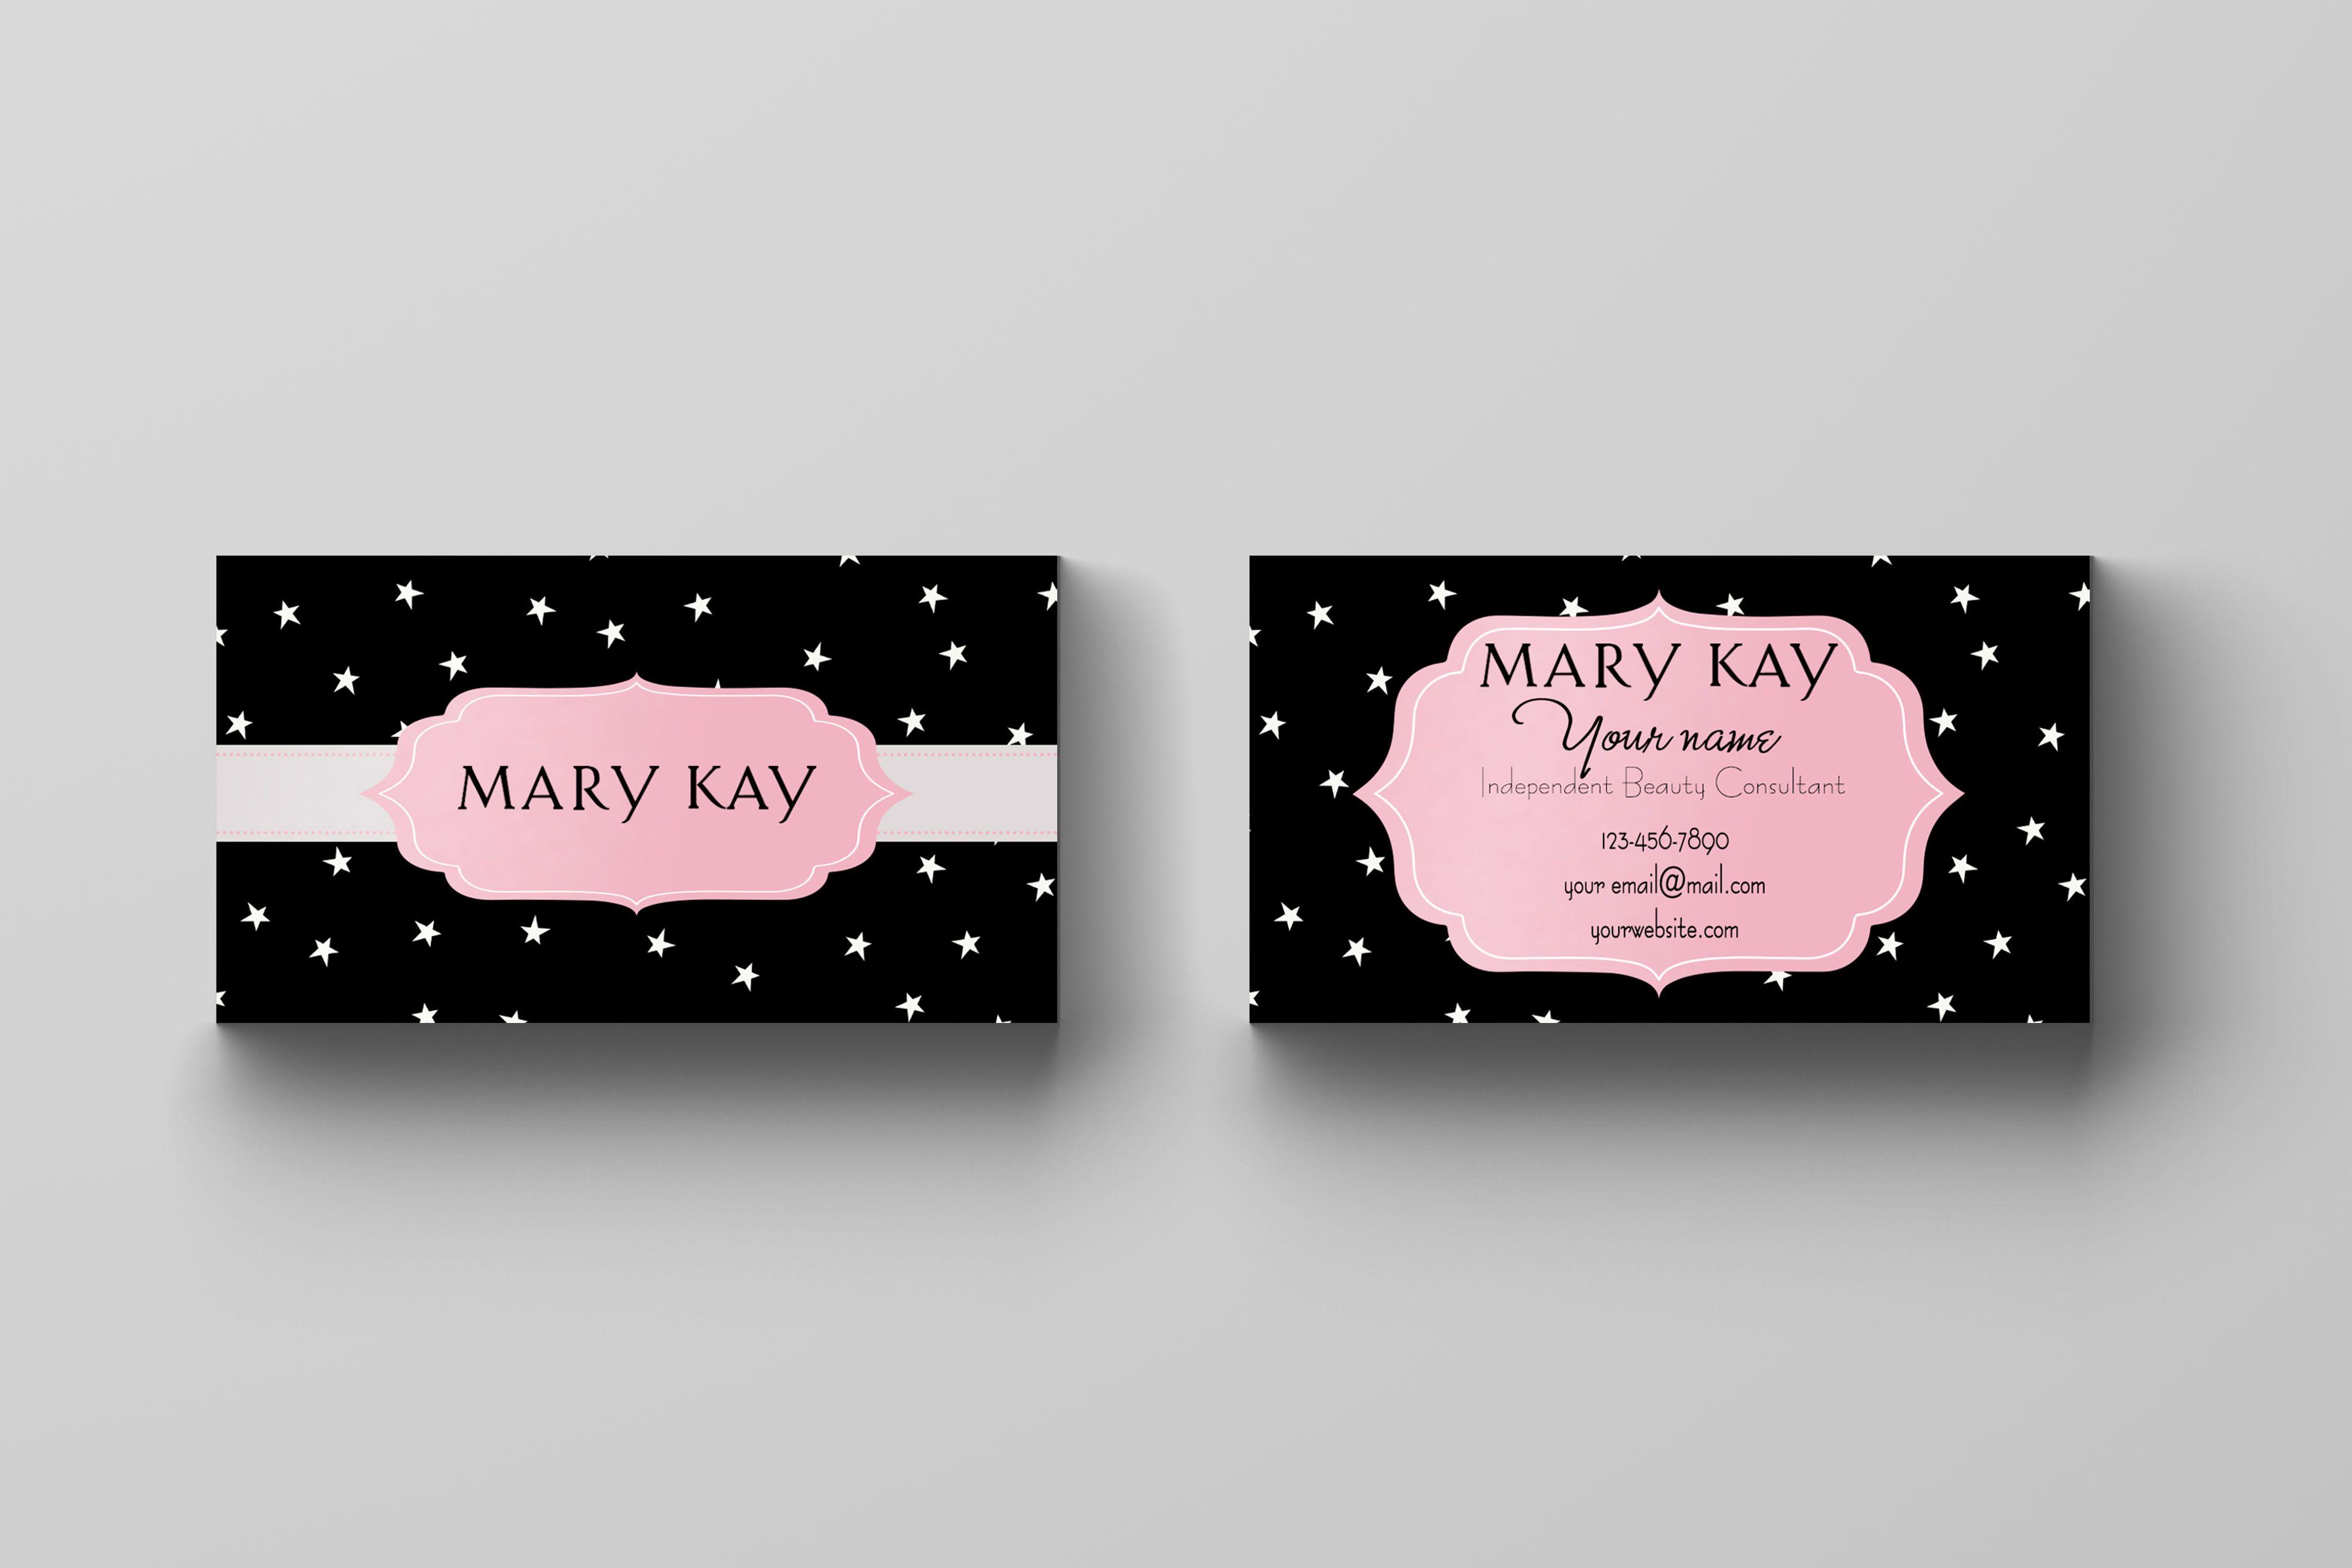 Mary Kay Business Card Stars Kakaodesigns Mary Kay Business Cards Mary Kay Business Mary Kay